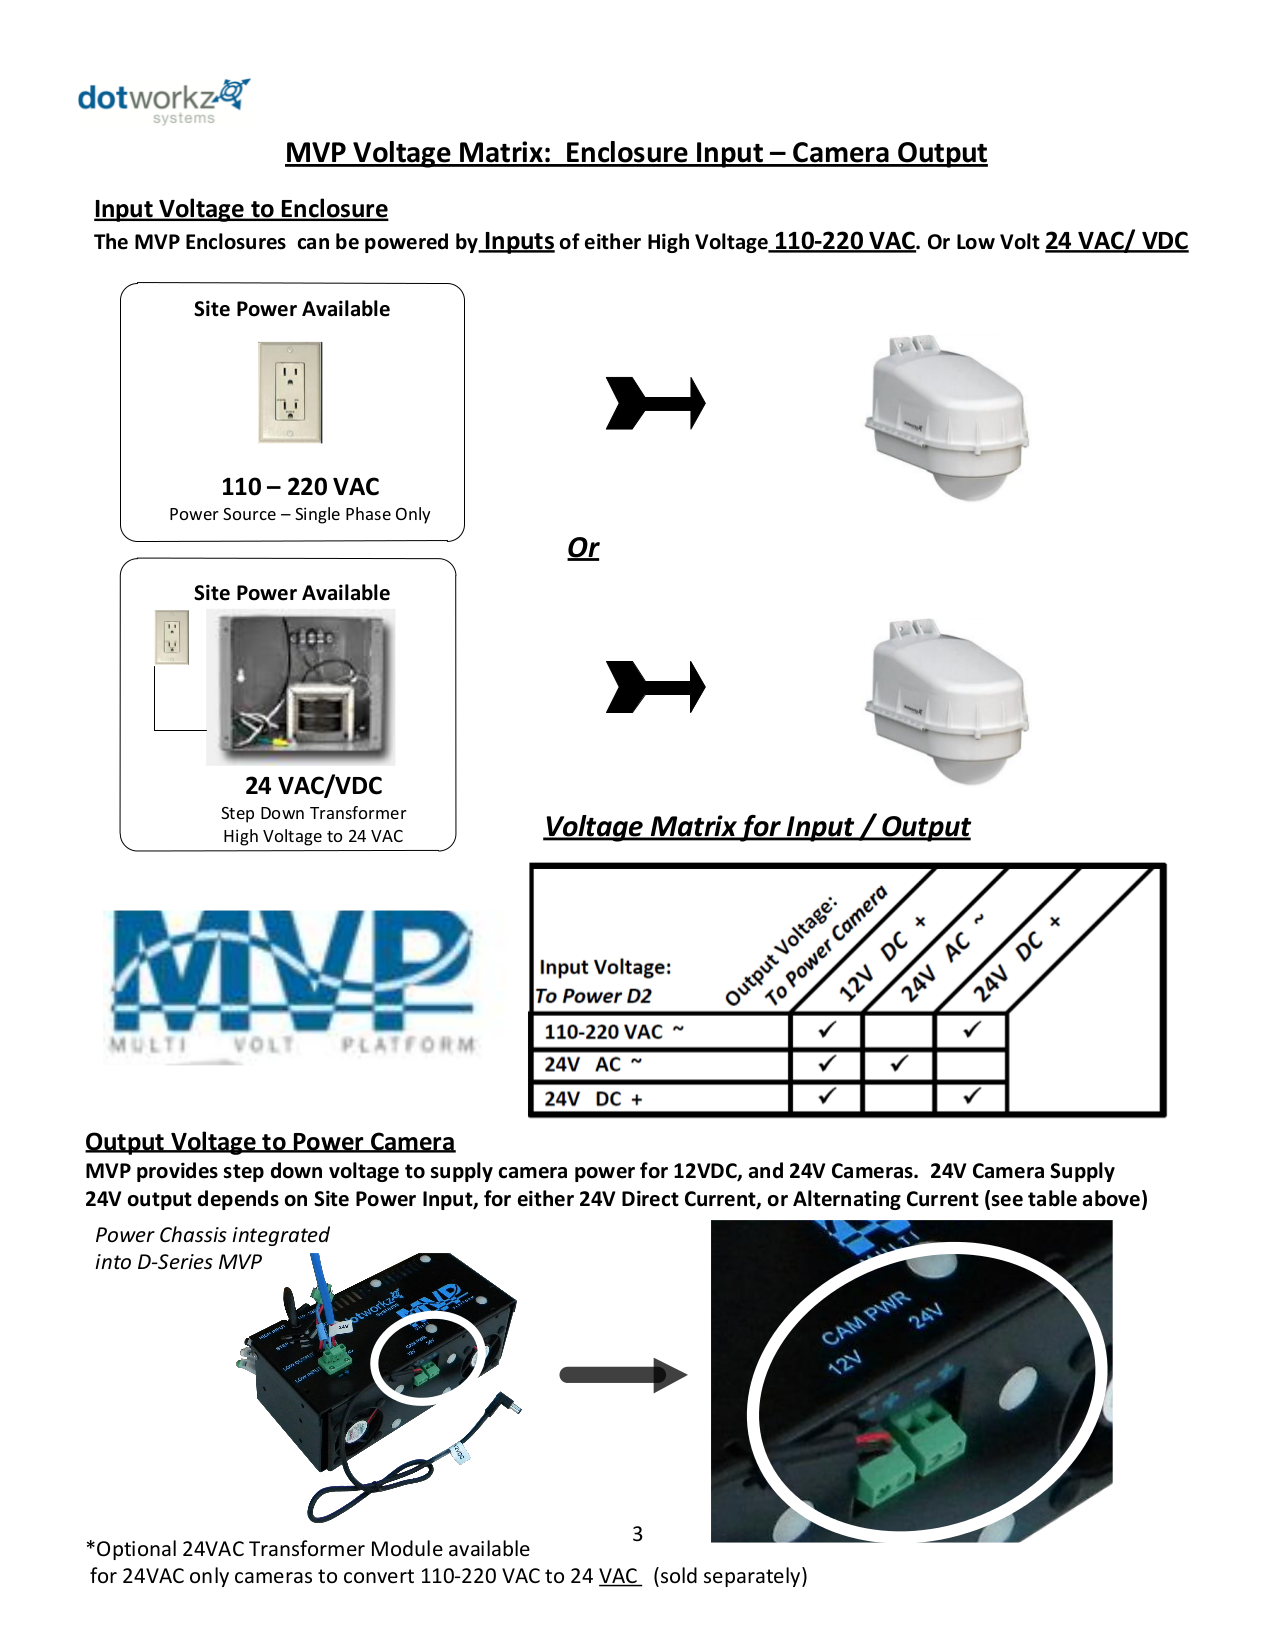 PDF manual for Panasonic Security Camera BB-HCM381A